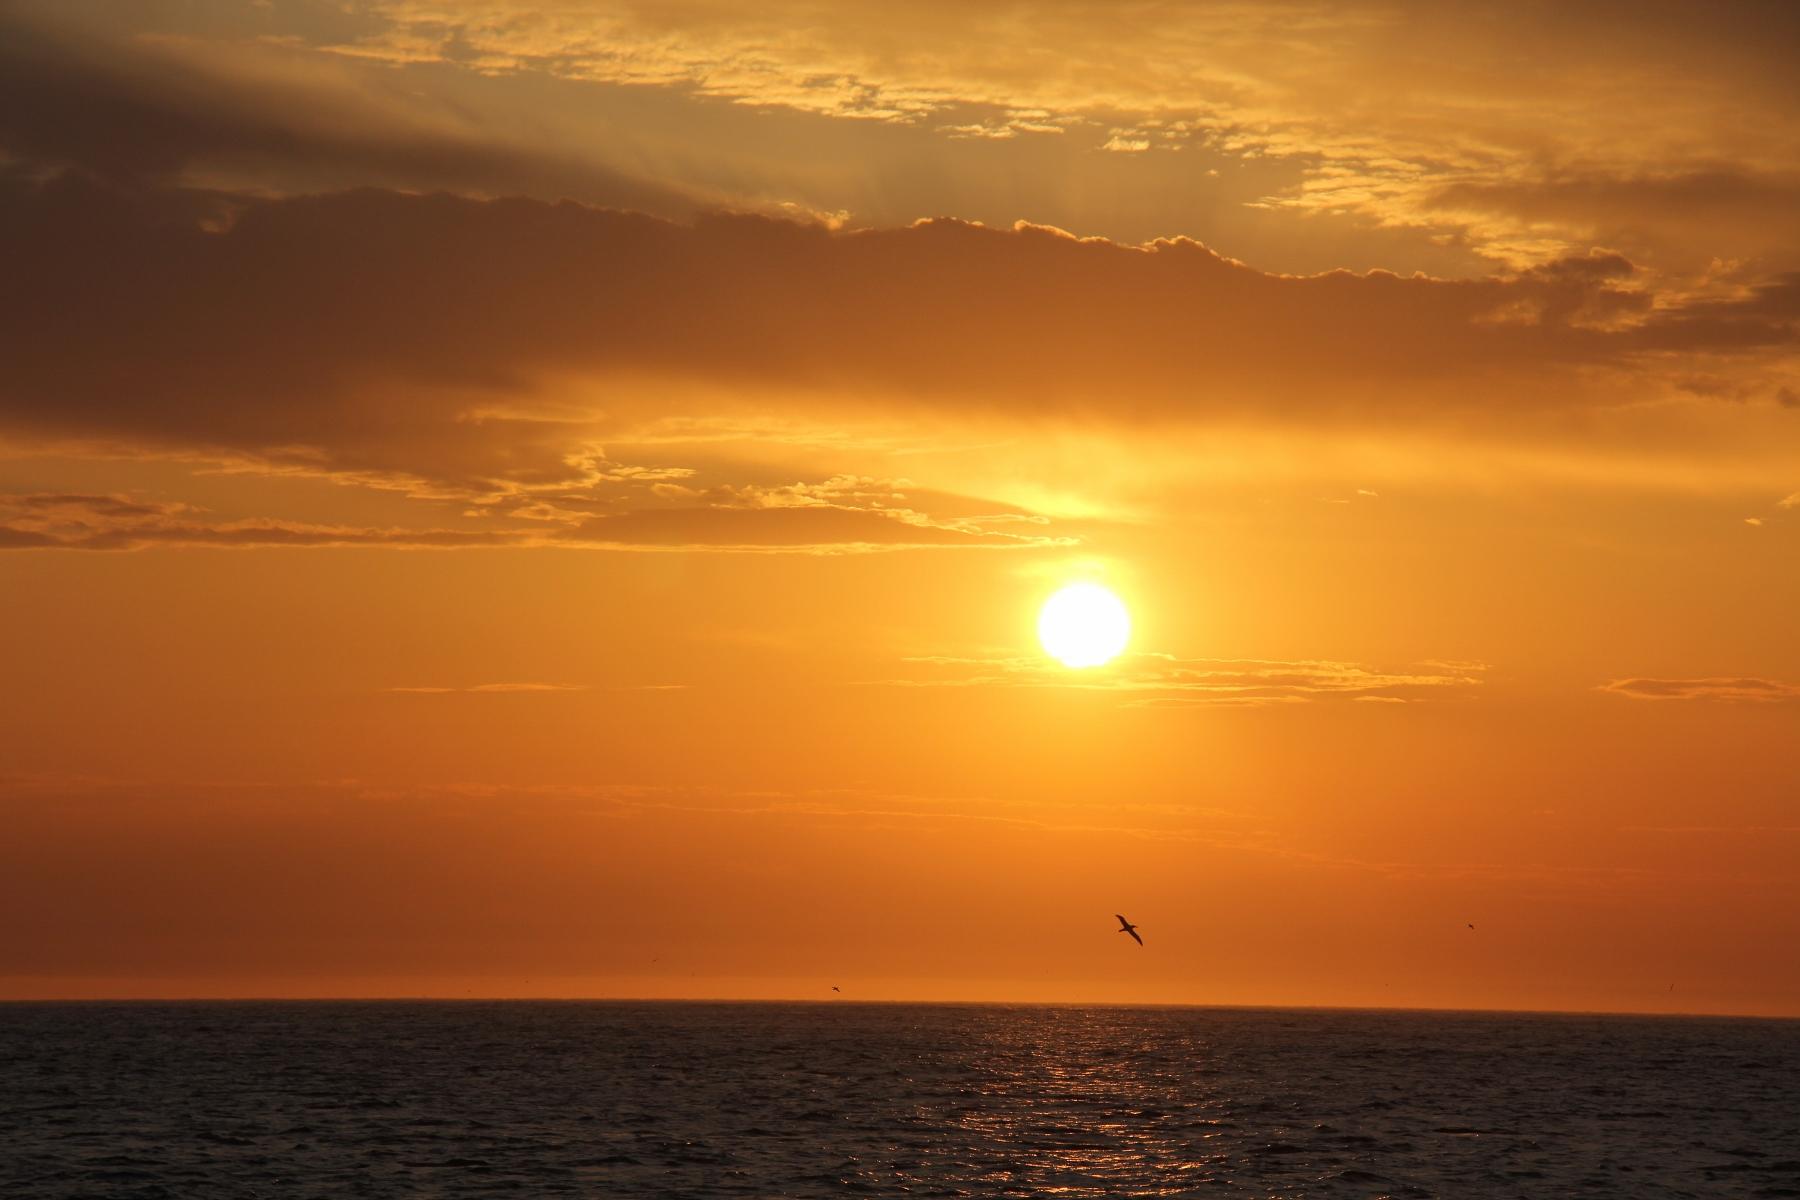 A rad sun set that Benn captured.